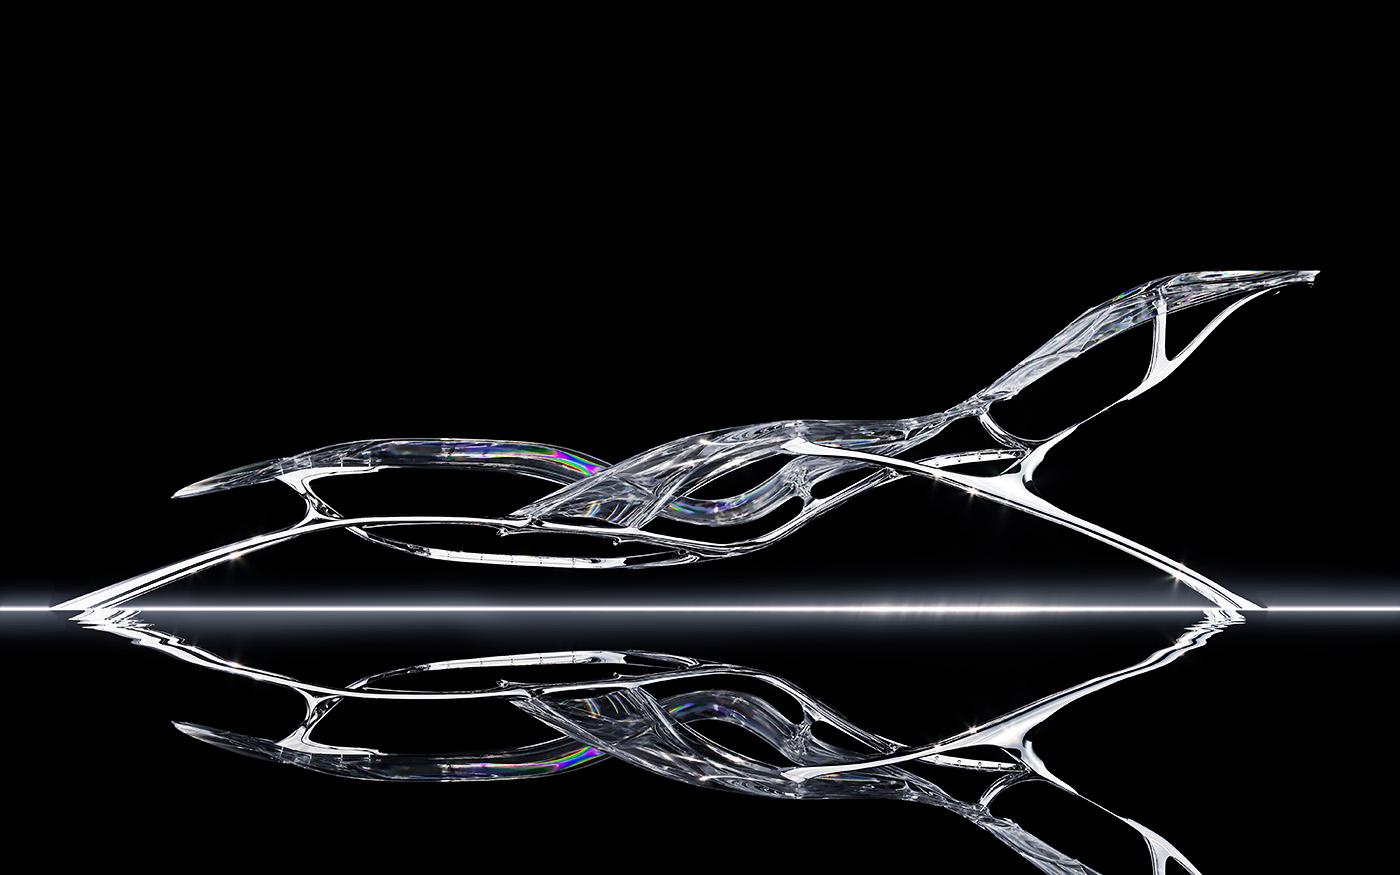 Luxury futuristic lounger 4.jpg